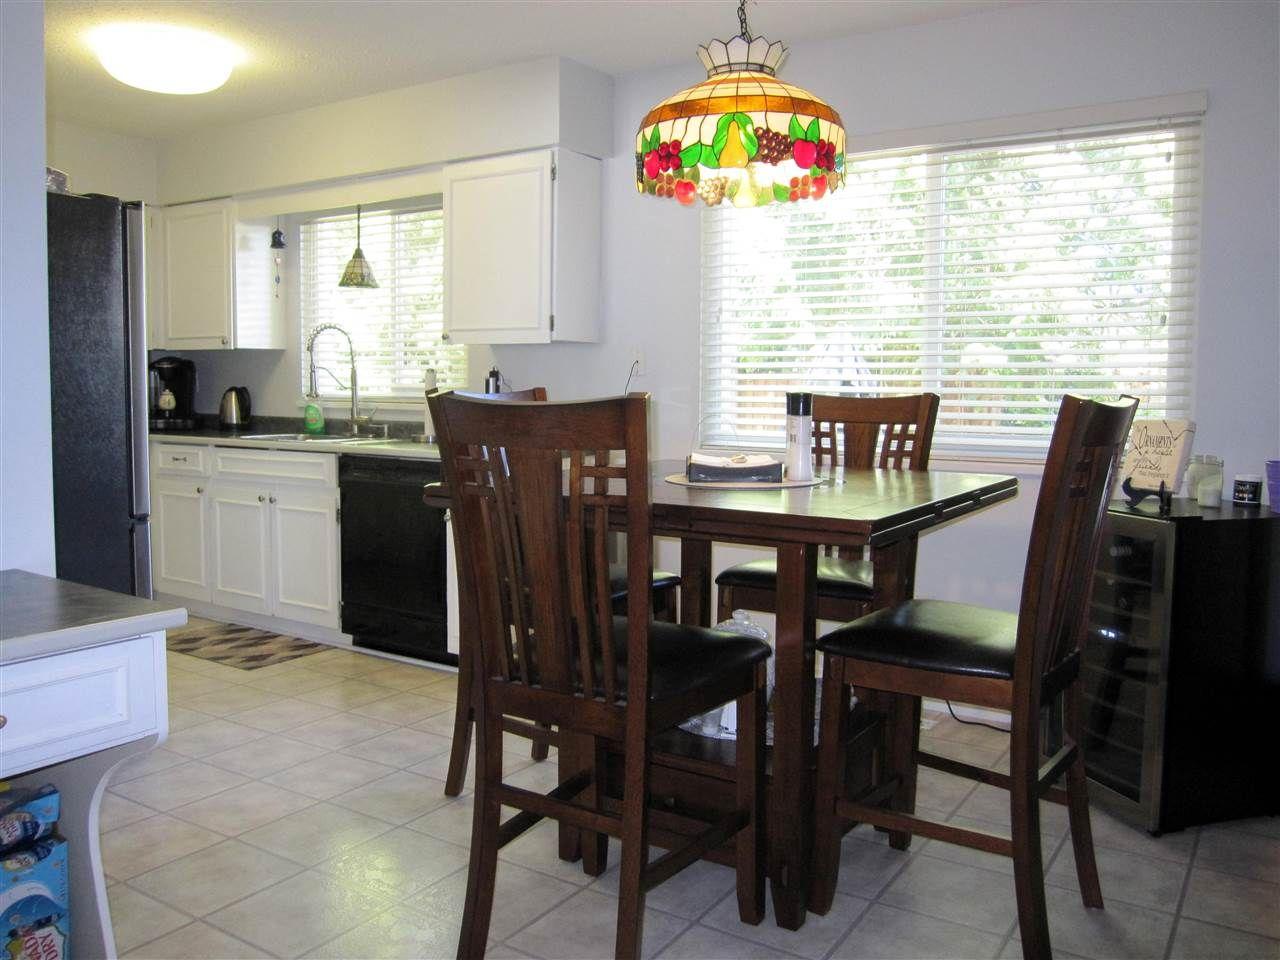 Photo 6: Photos: 21155 CUTLER Place in Maple Ridge: Southwest Maple Ridge House for sale : MLS®# R2101980